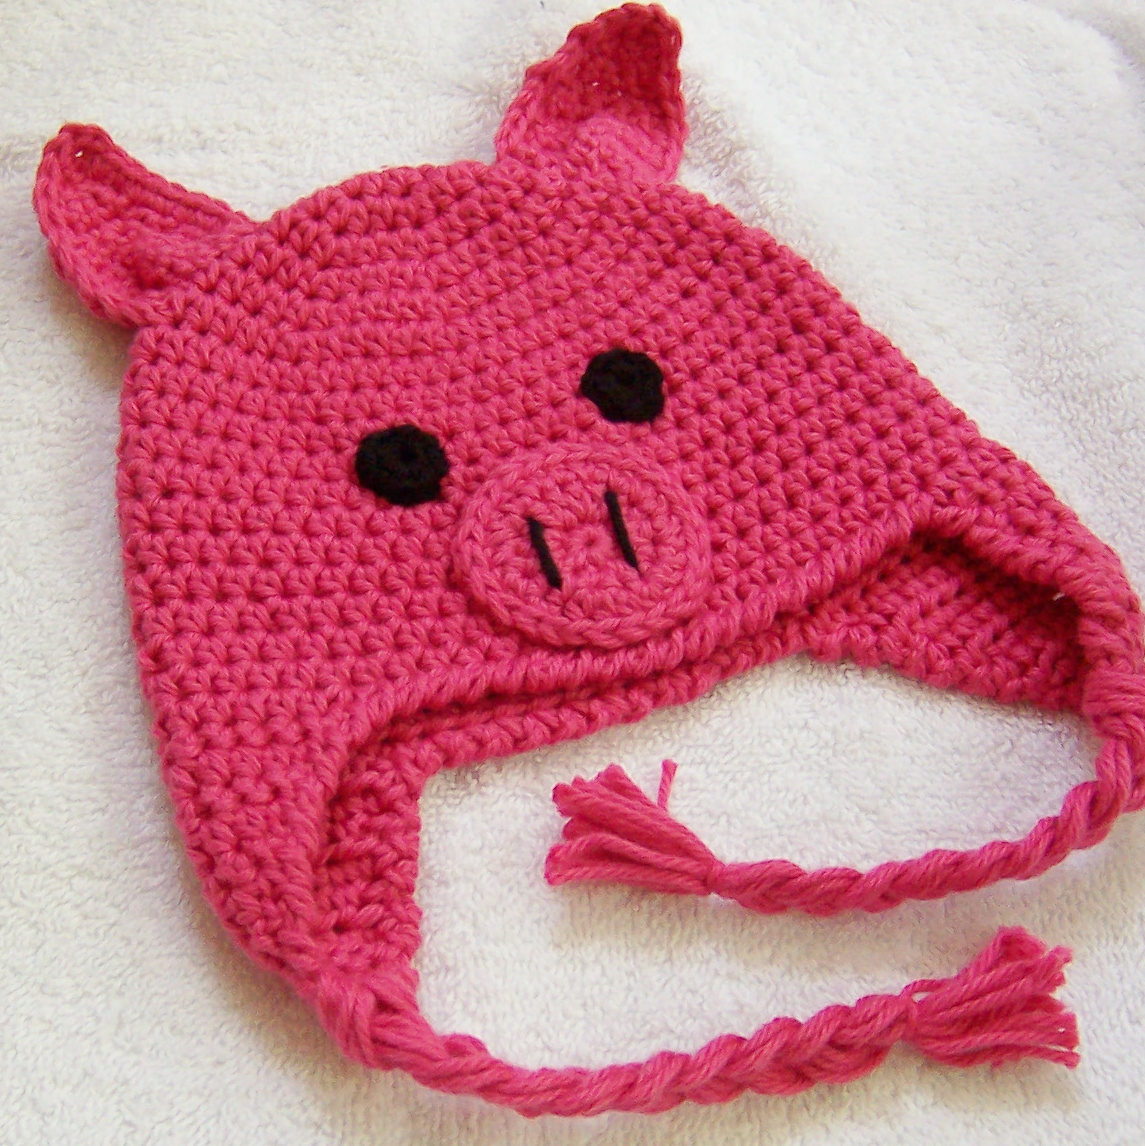 Free Crochet Baby Pig Hat Pattern : Hat-Pig, Oink! Oink! Crochet By Darleen Hopkins